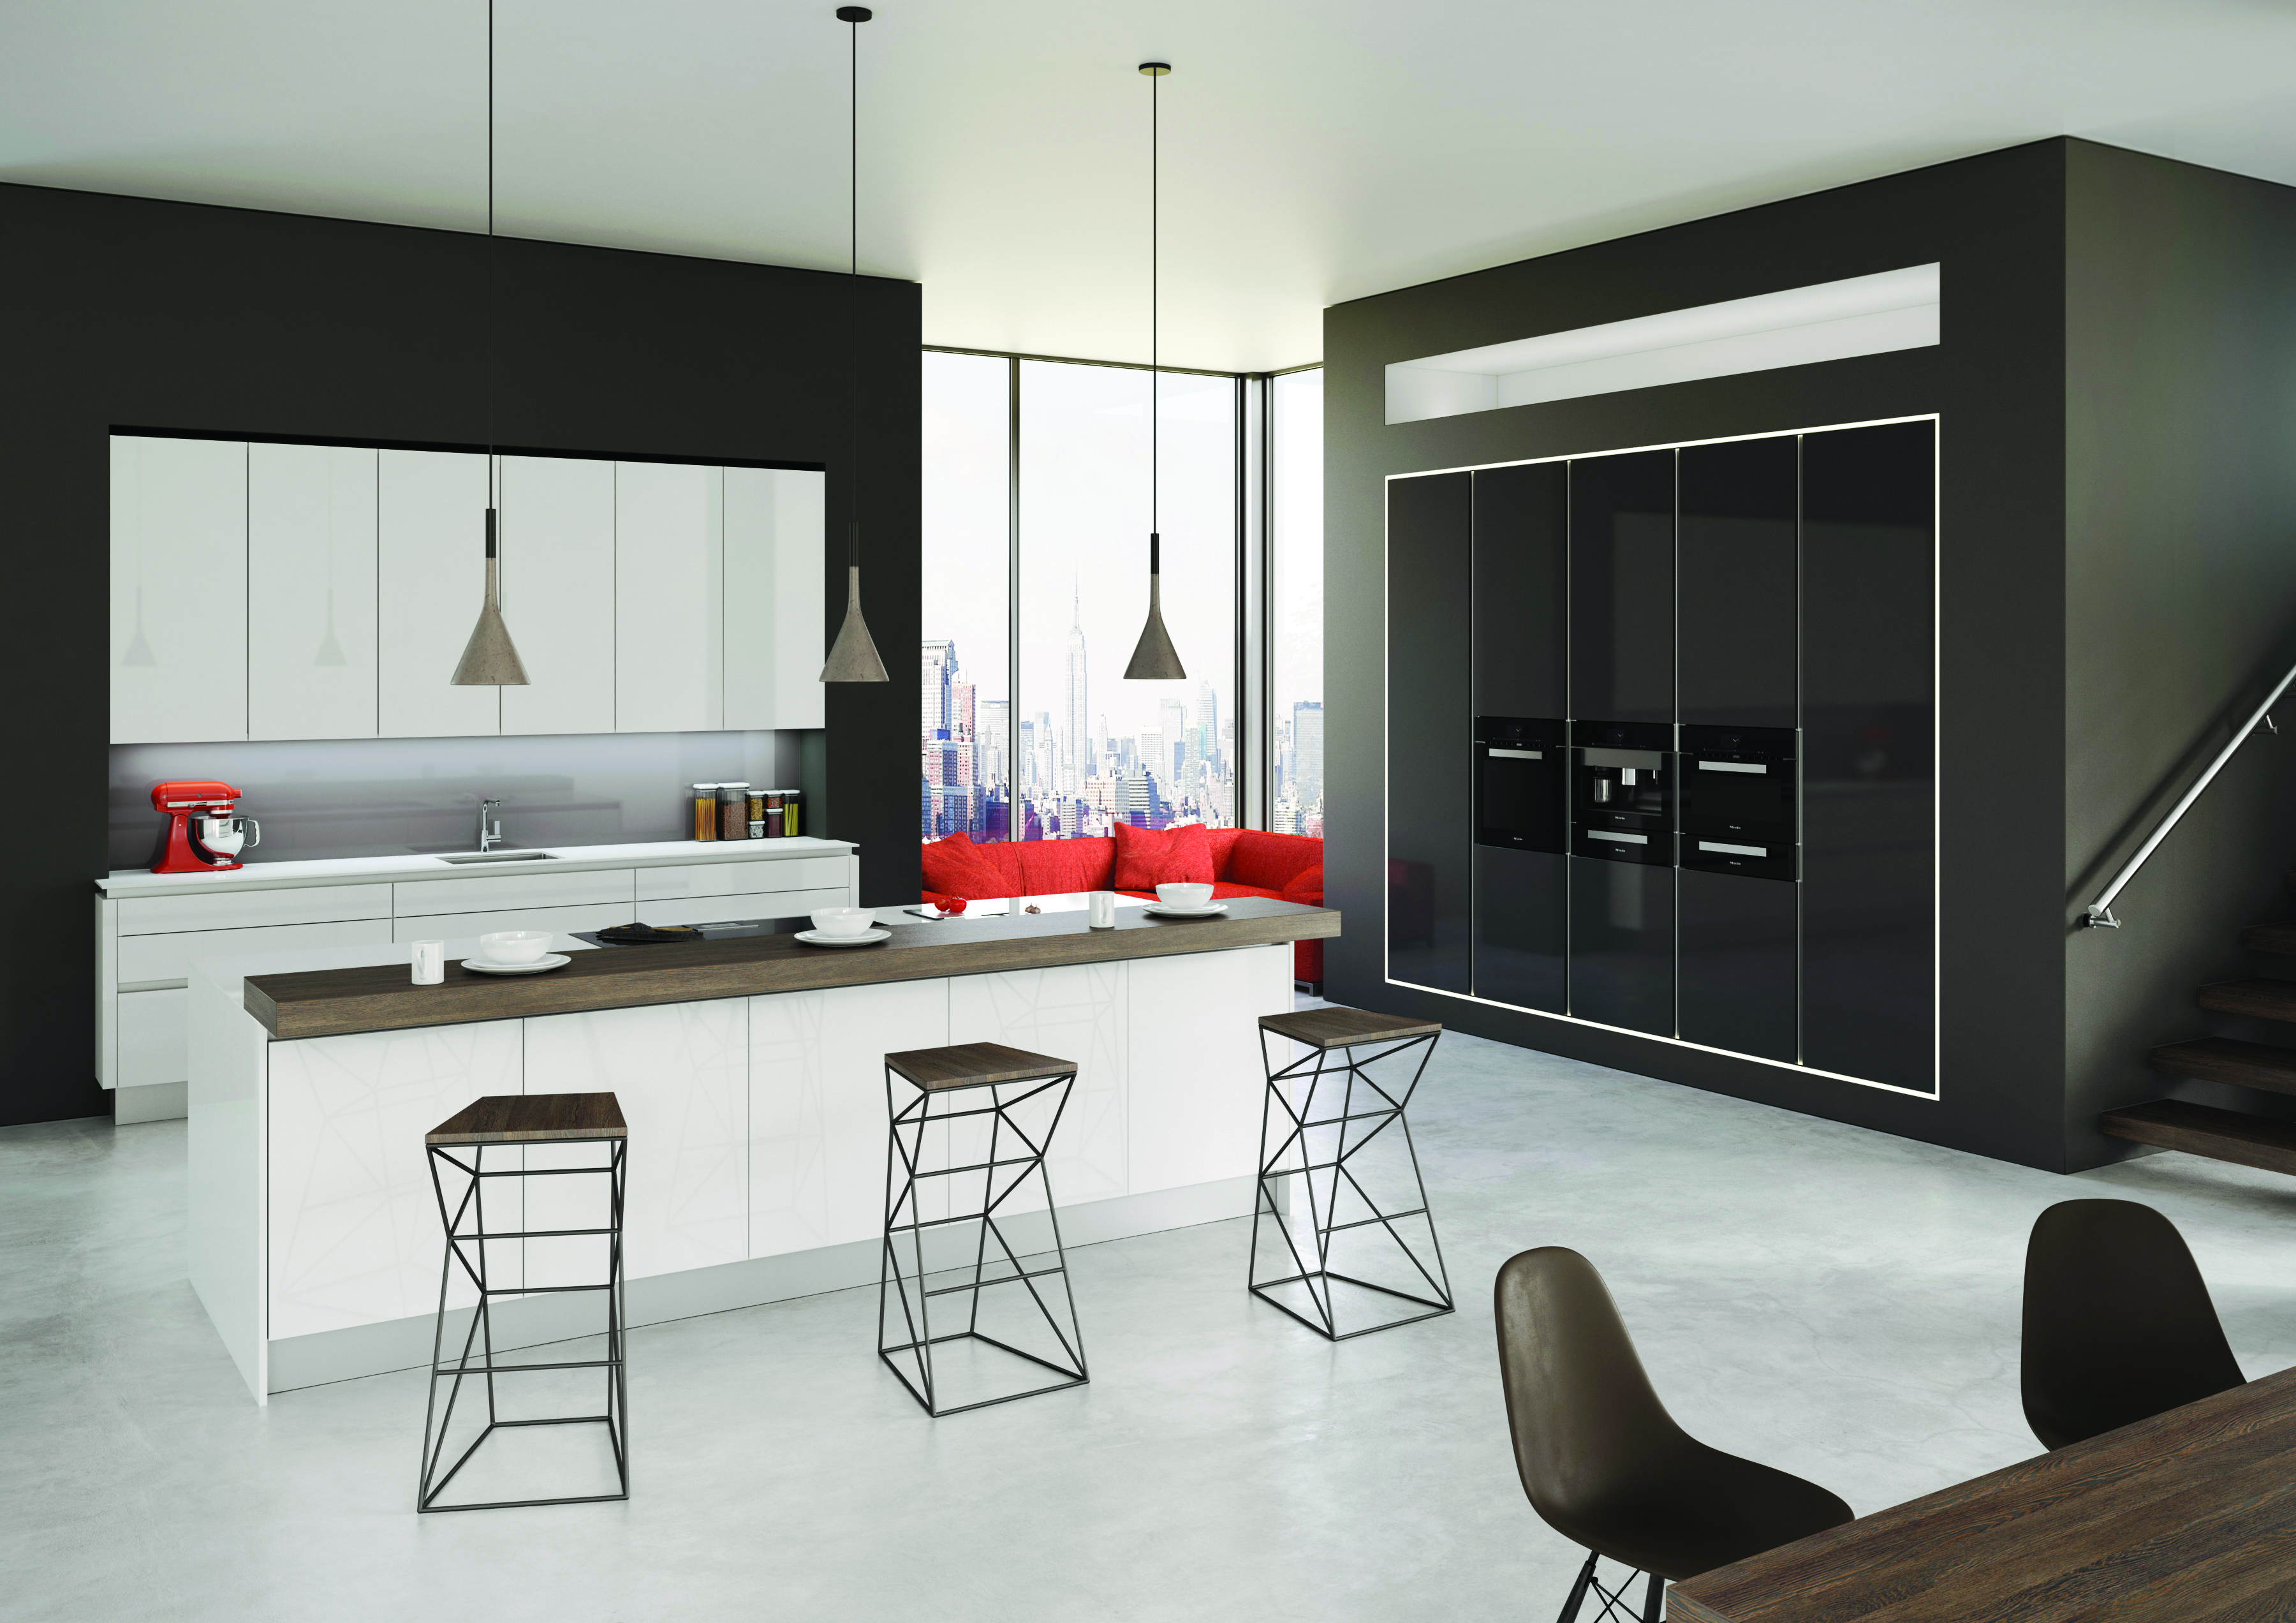 Bluewater Bathrooms Kitchens Grand Designs Live 2015 Birmingham Bluewater Bathrooms